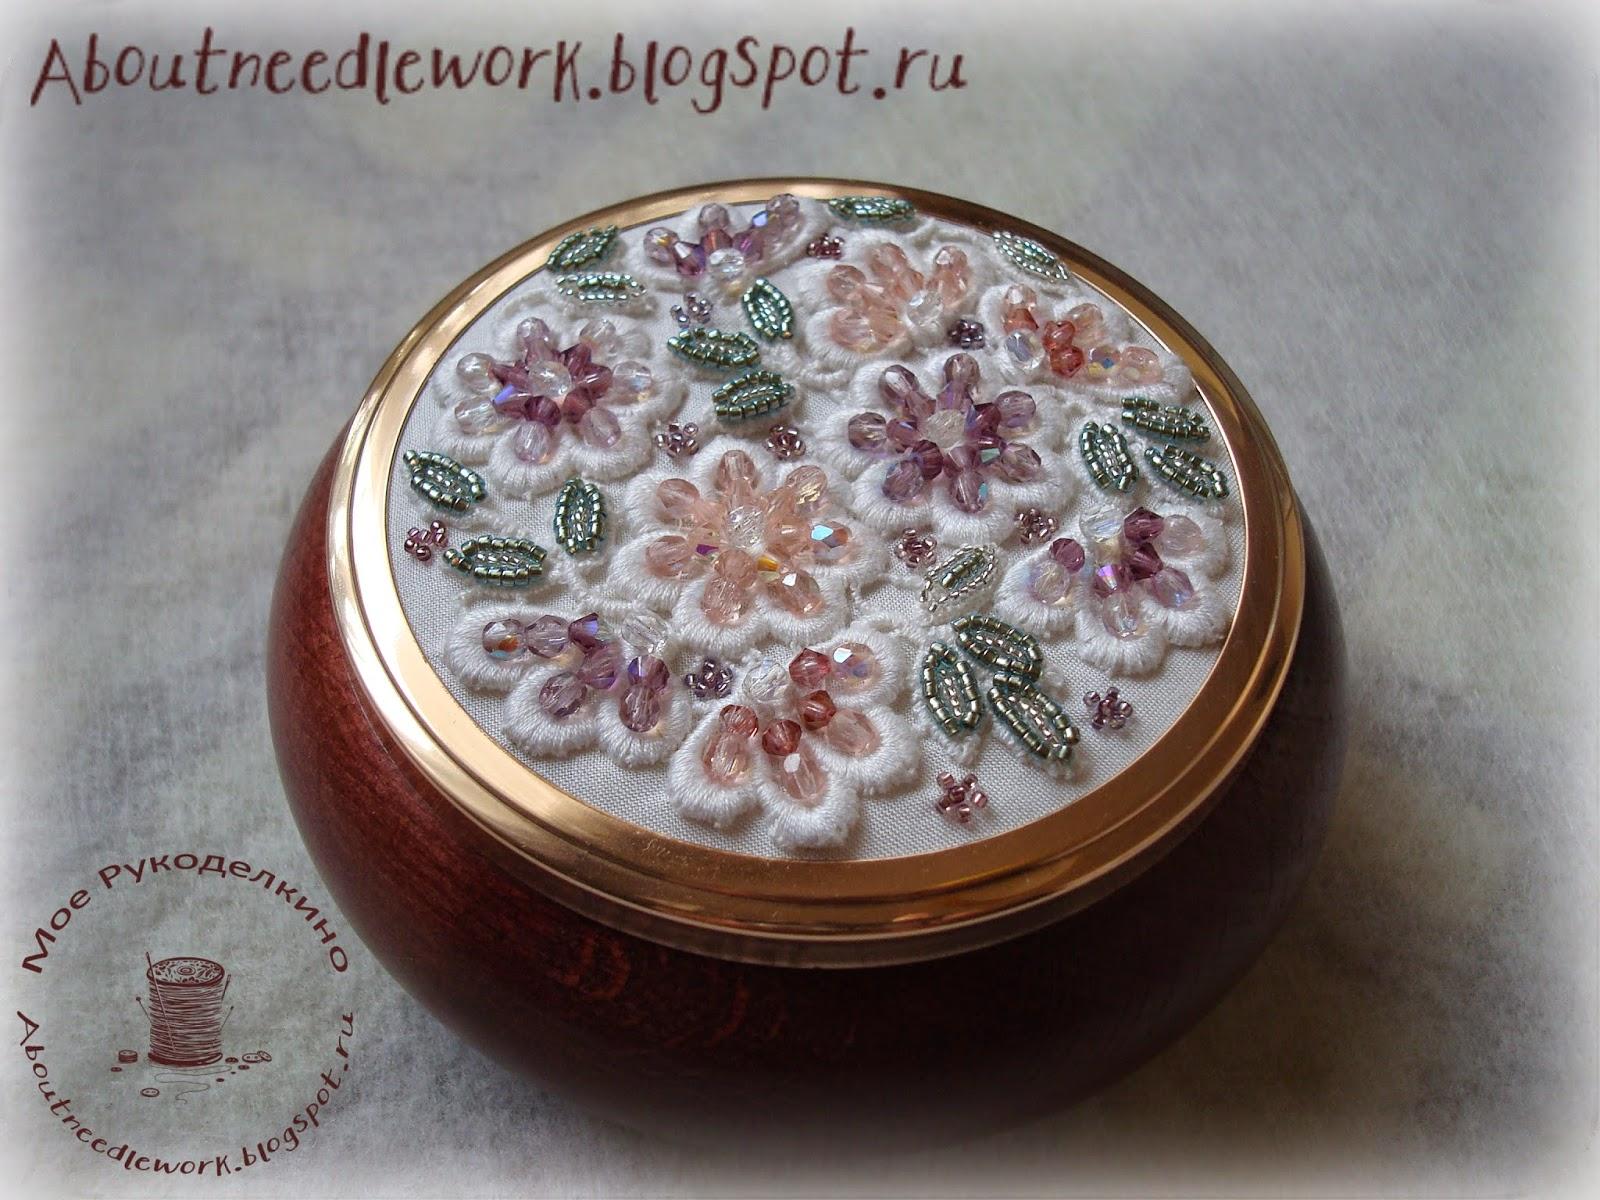 Шкатулка: вышивка бисером